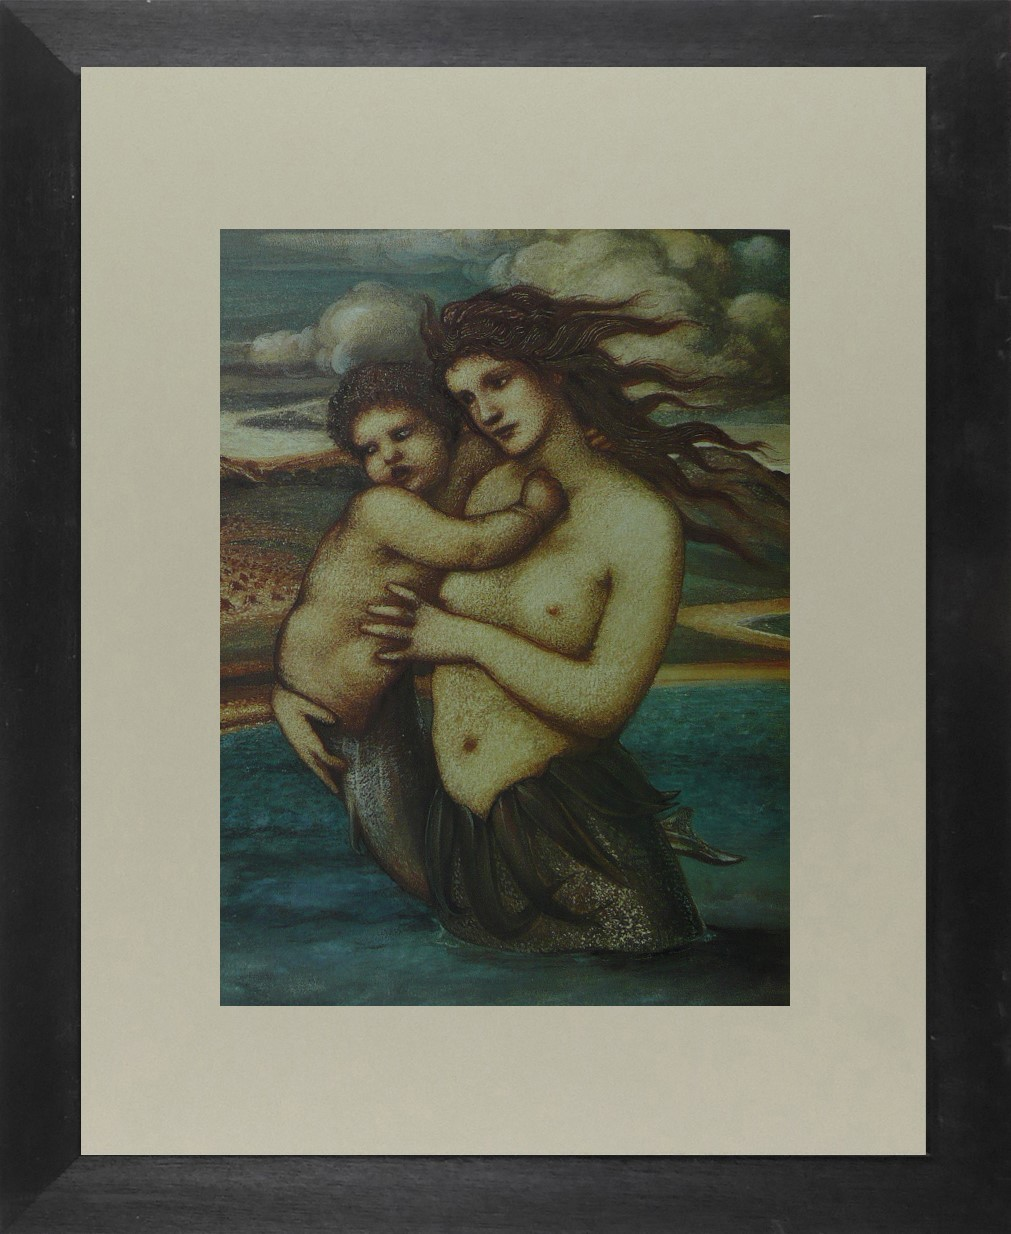 The Mermaid - Sir Edward Coley Burne-Jones - Framed Picture 11 x 14